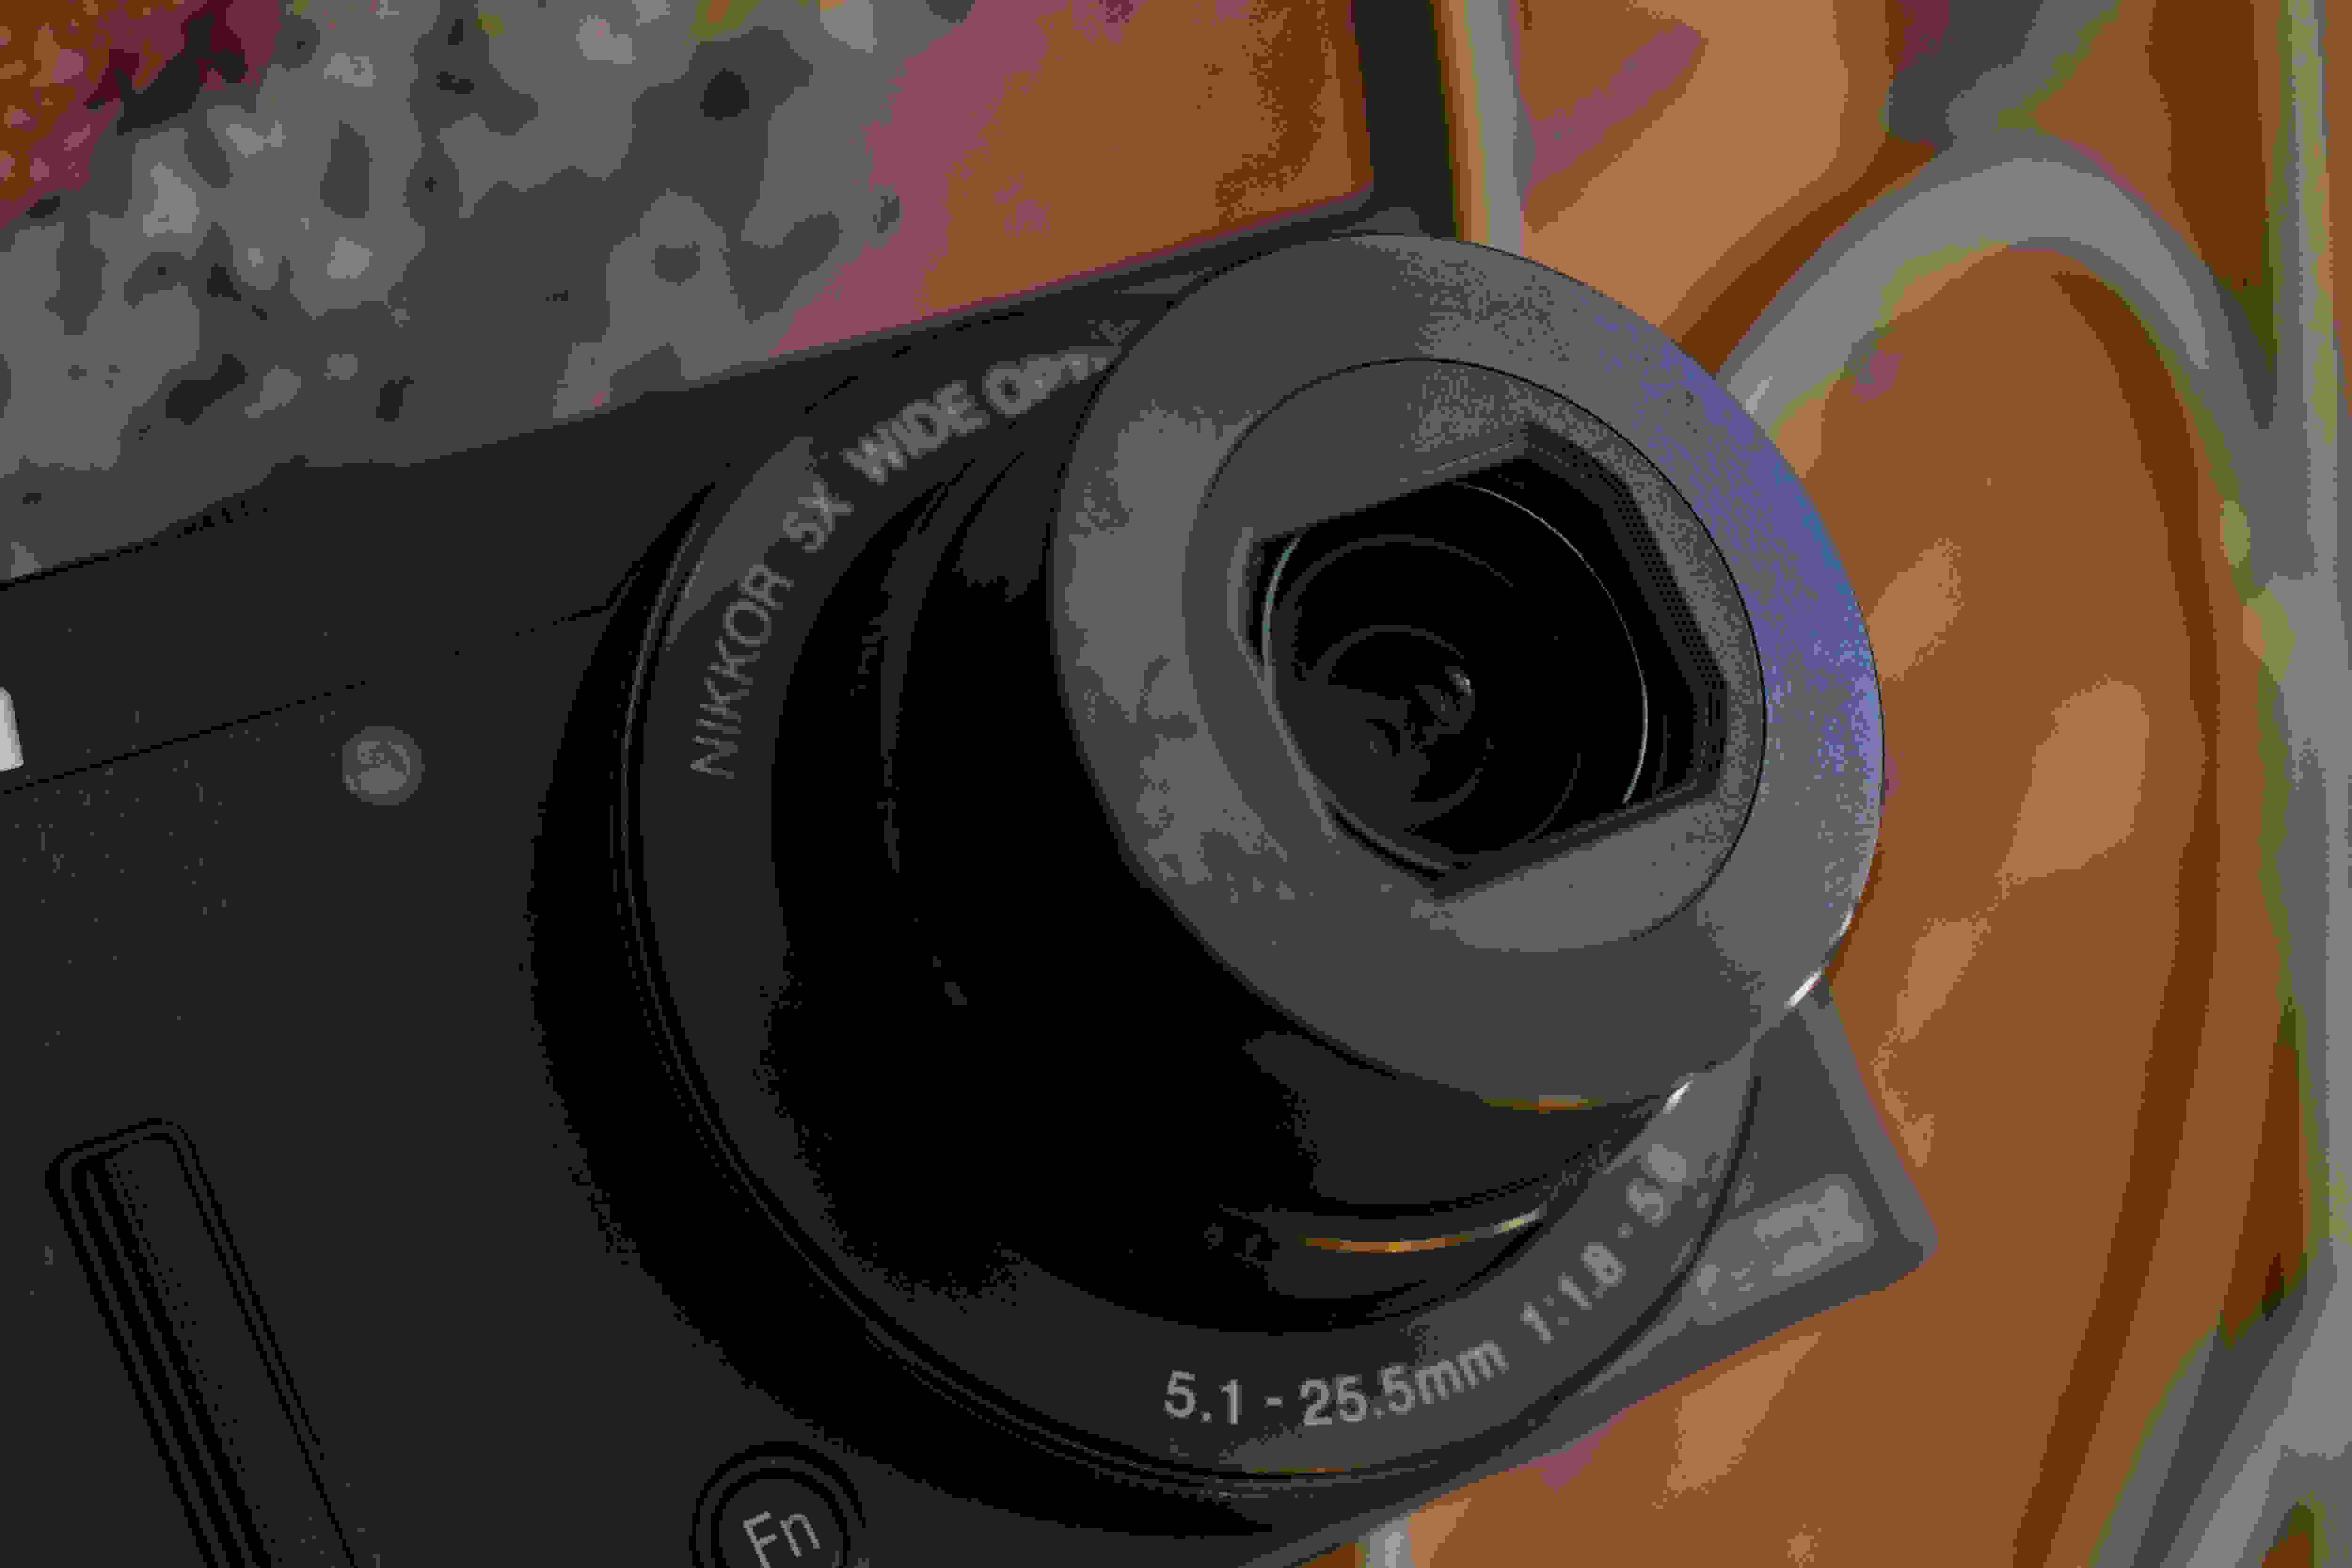 A photograph of the Nikon Coolpix P340's lens.